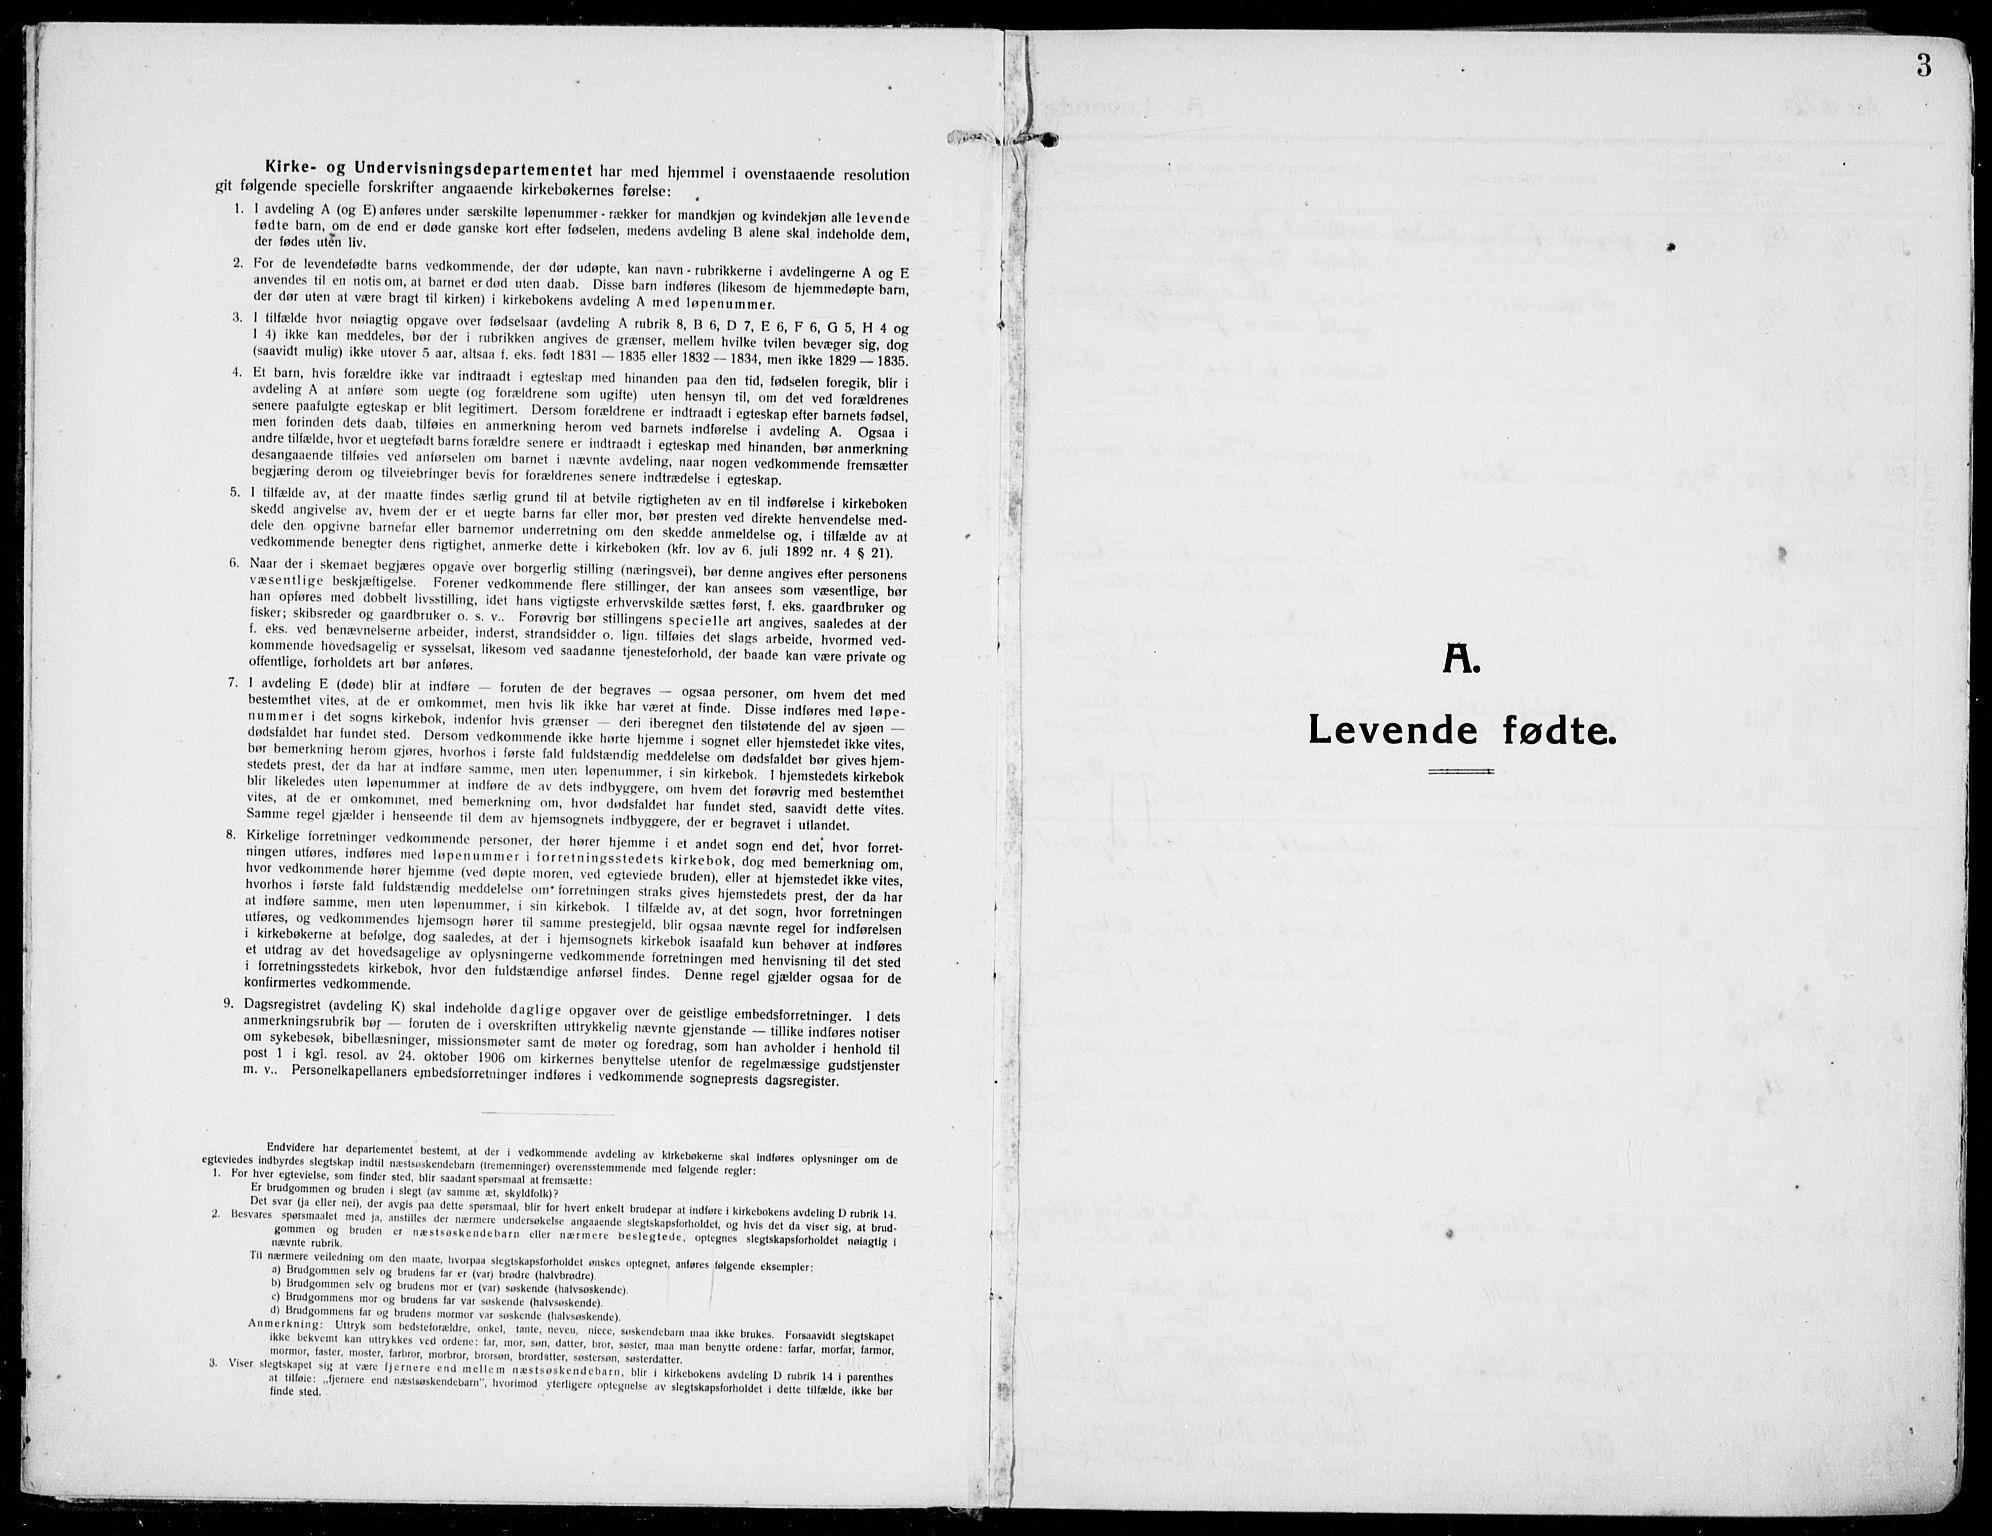 SAKO, Rjukan kirkebøker, F/Fa/L0002: Ministerialbok nr. 2, 1912-1917, s. 3